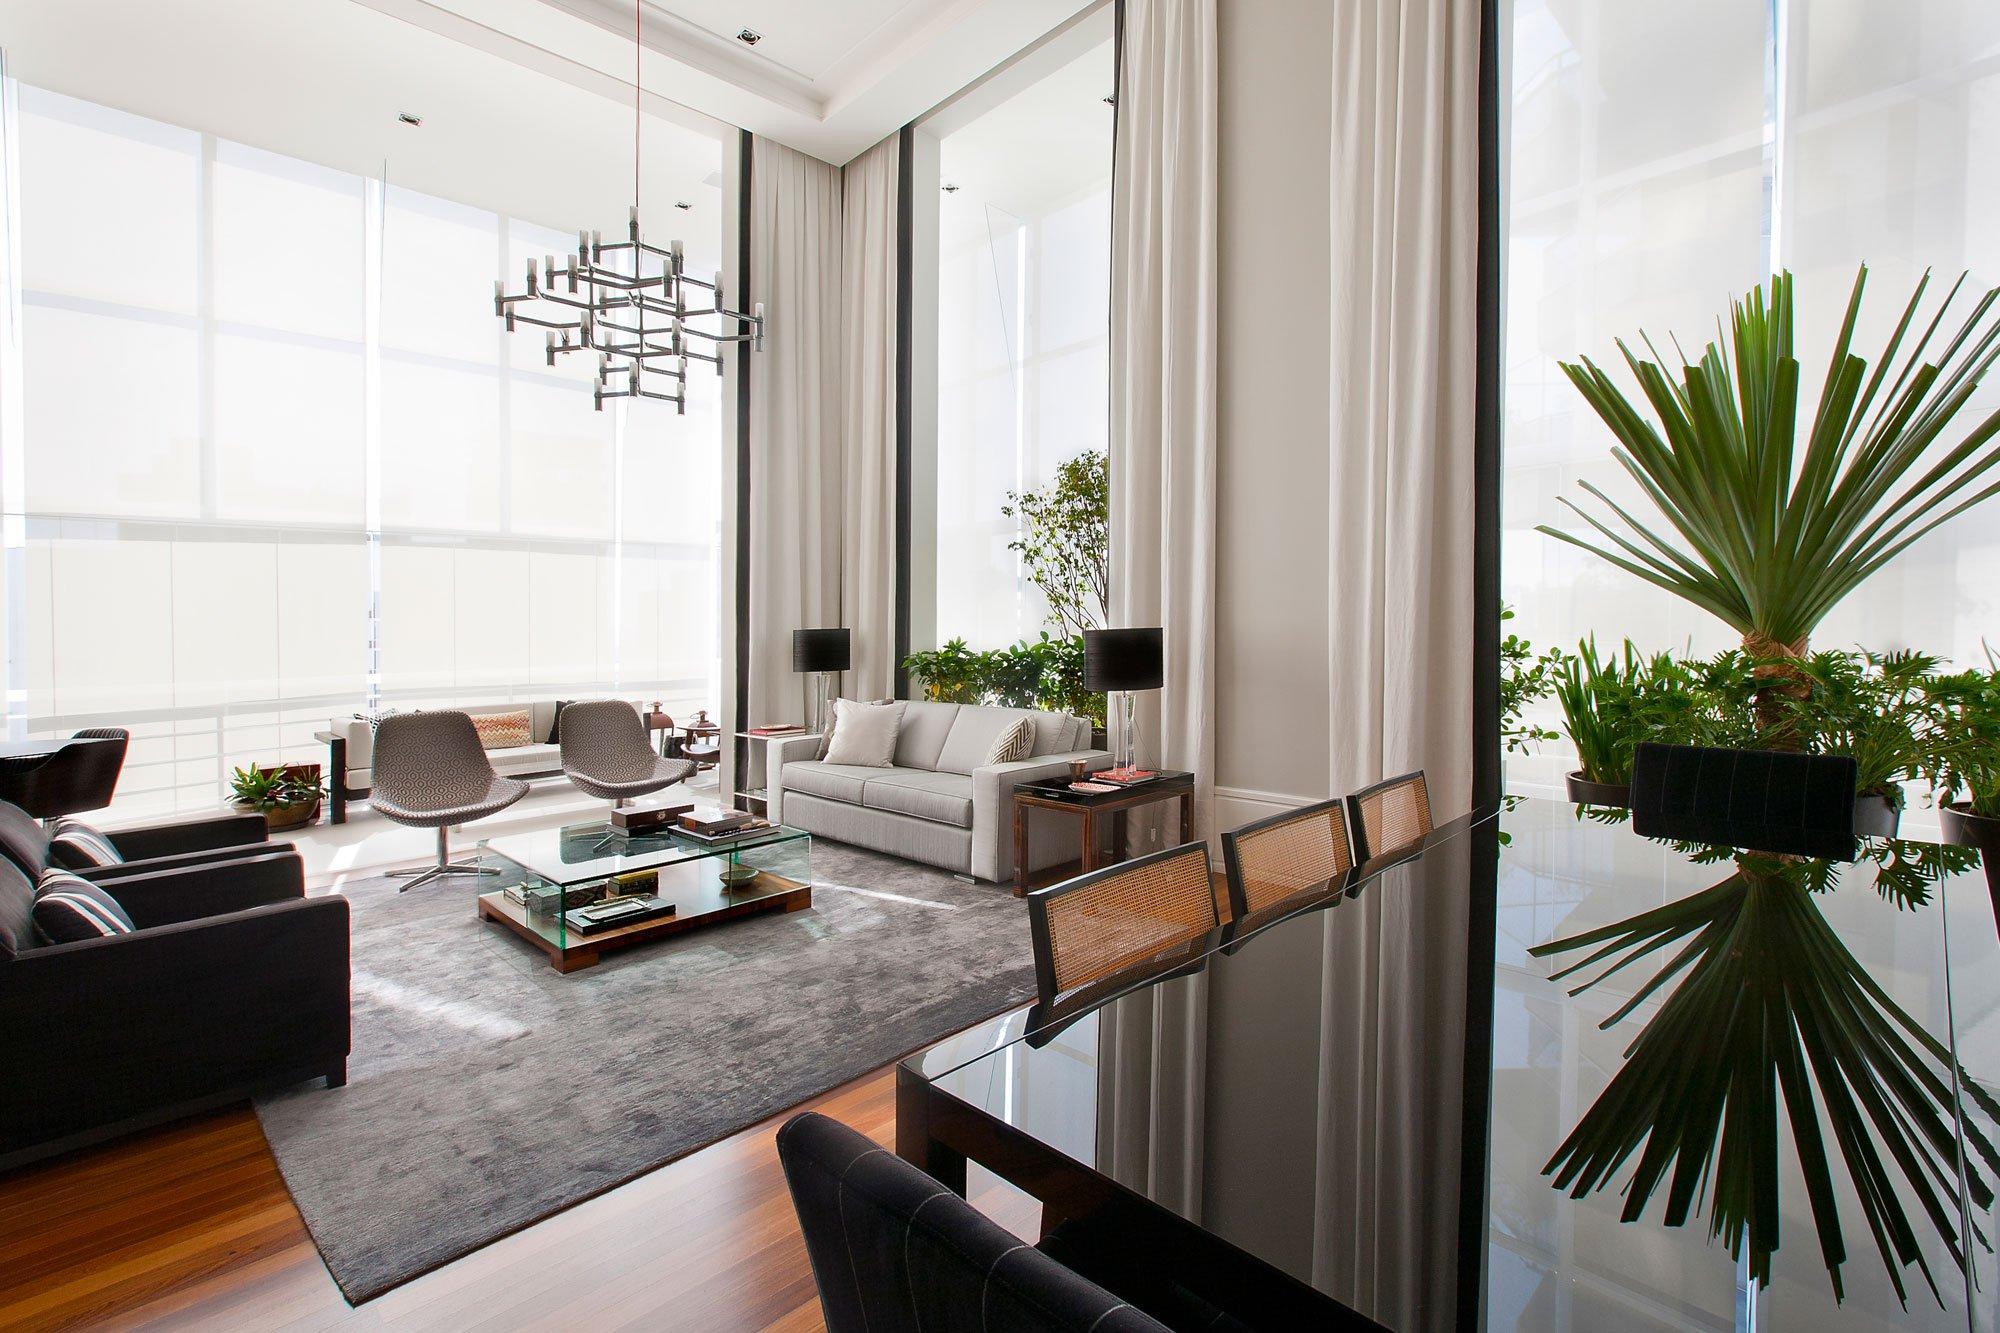 An-Elegant-Interior-19